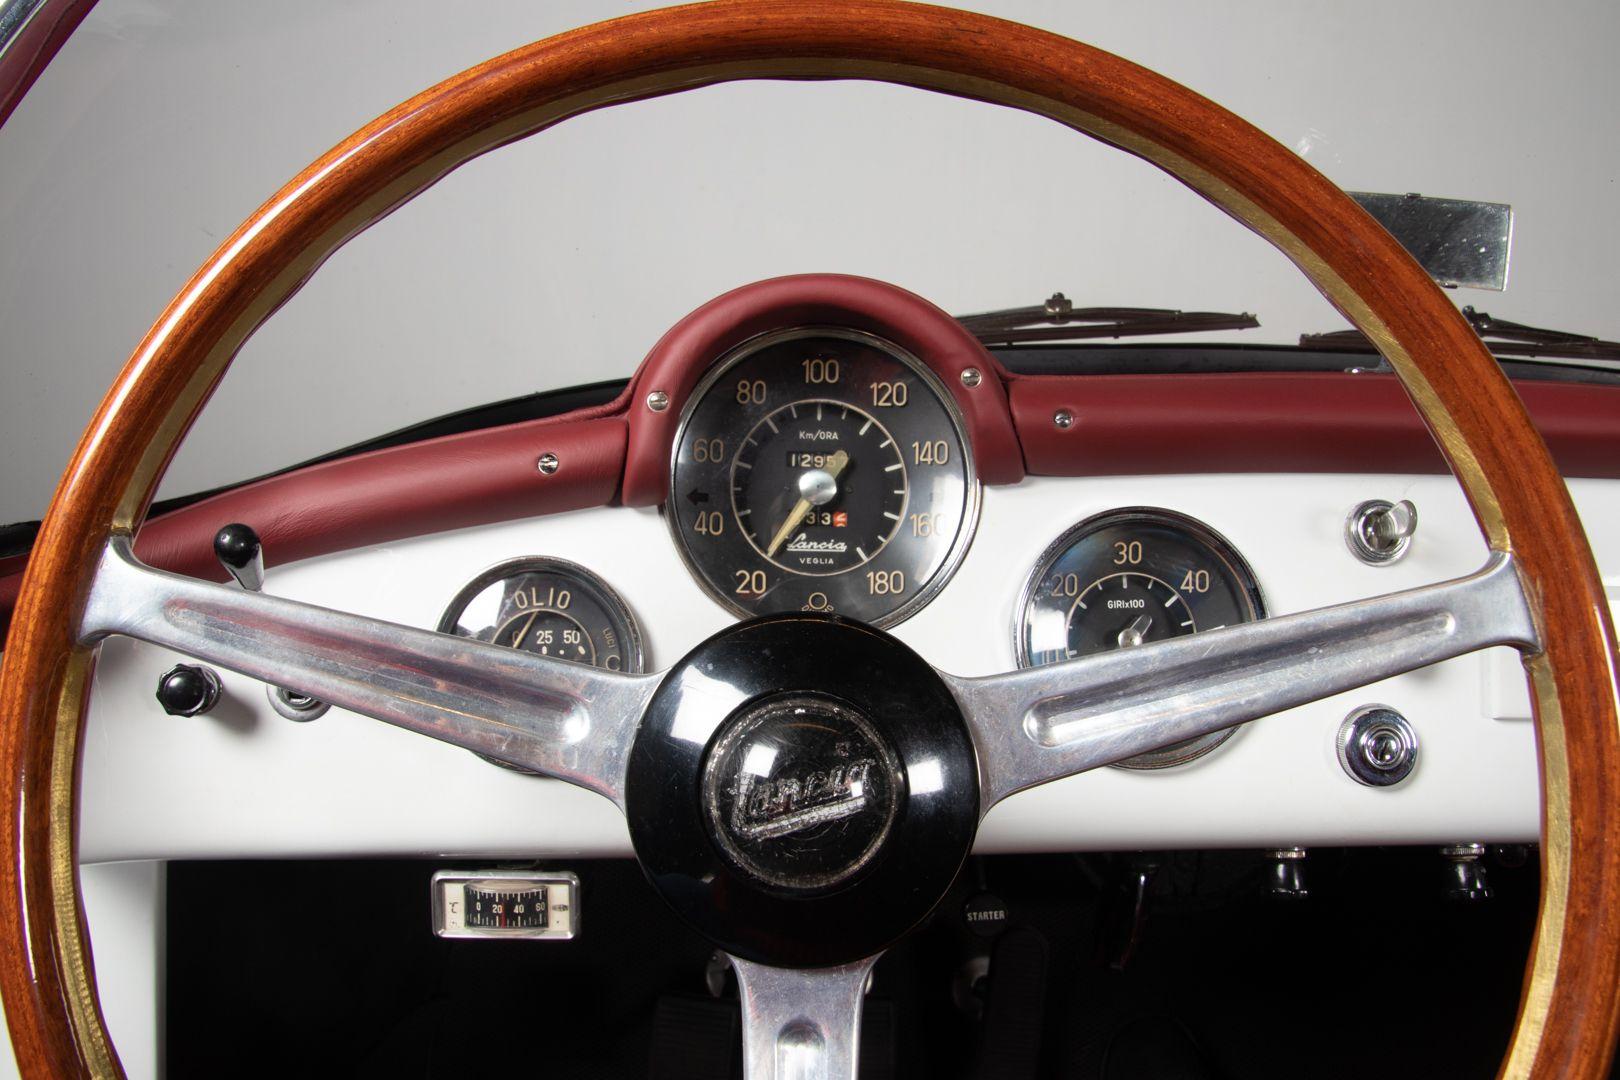 1955 Lancia Aurelia B24 S spider 23236